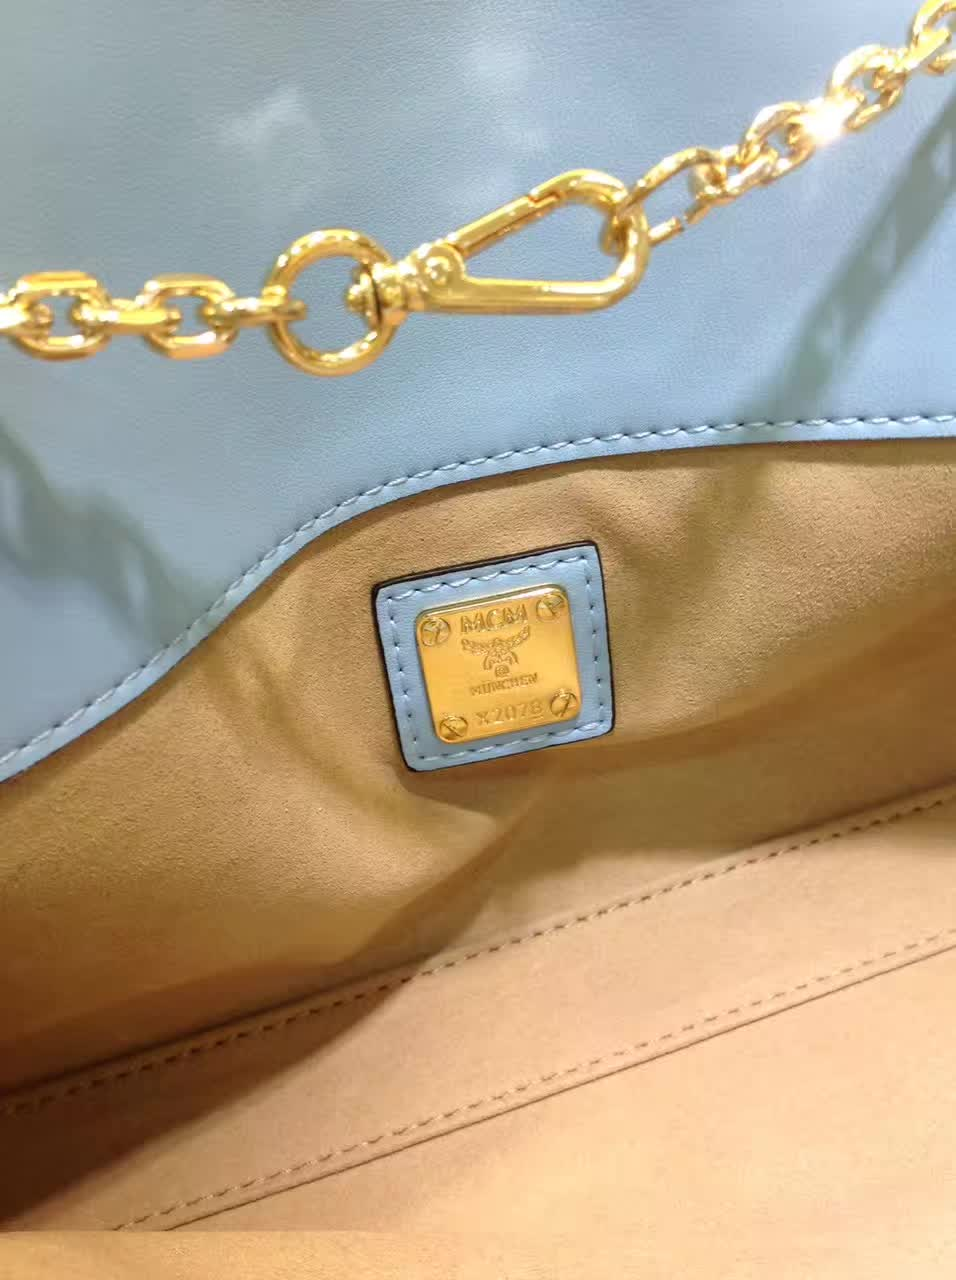 MCM官网同步 Visetos Patricia手袋 简约造型时尚优雅 雾霾蓝